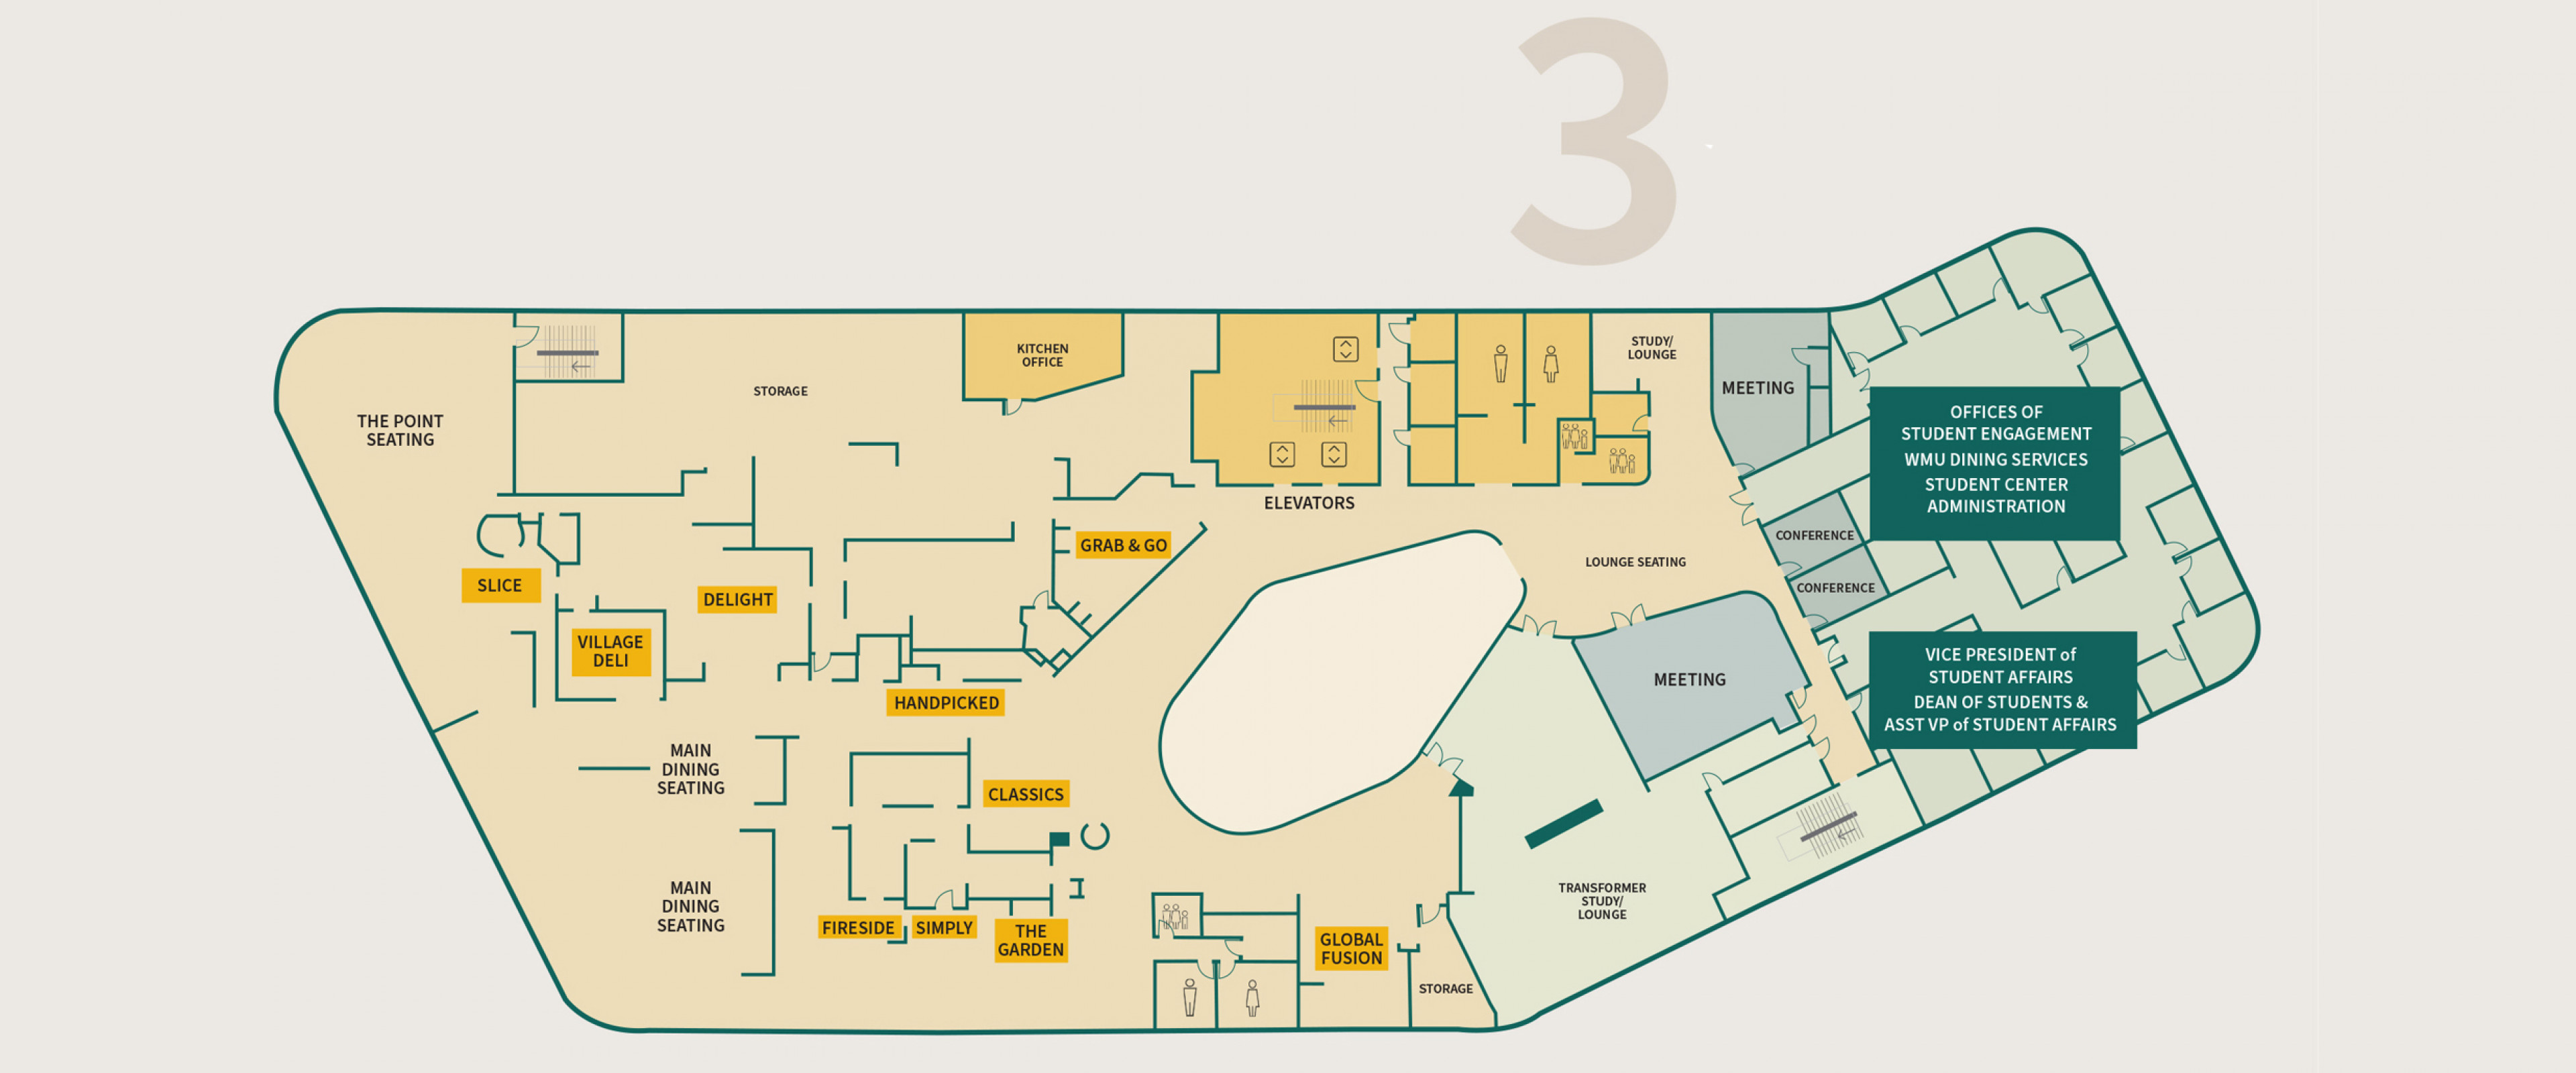 3rd floor of new student center